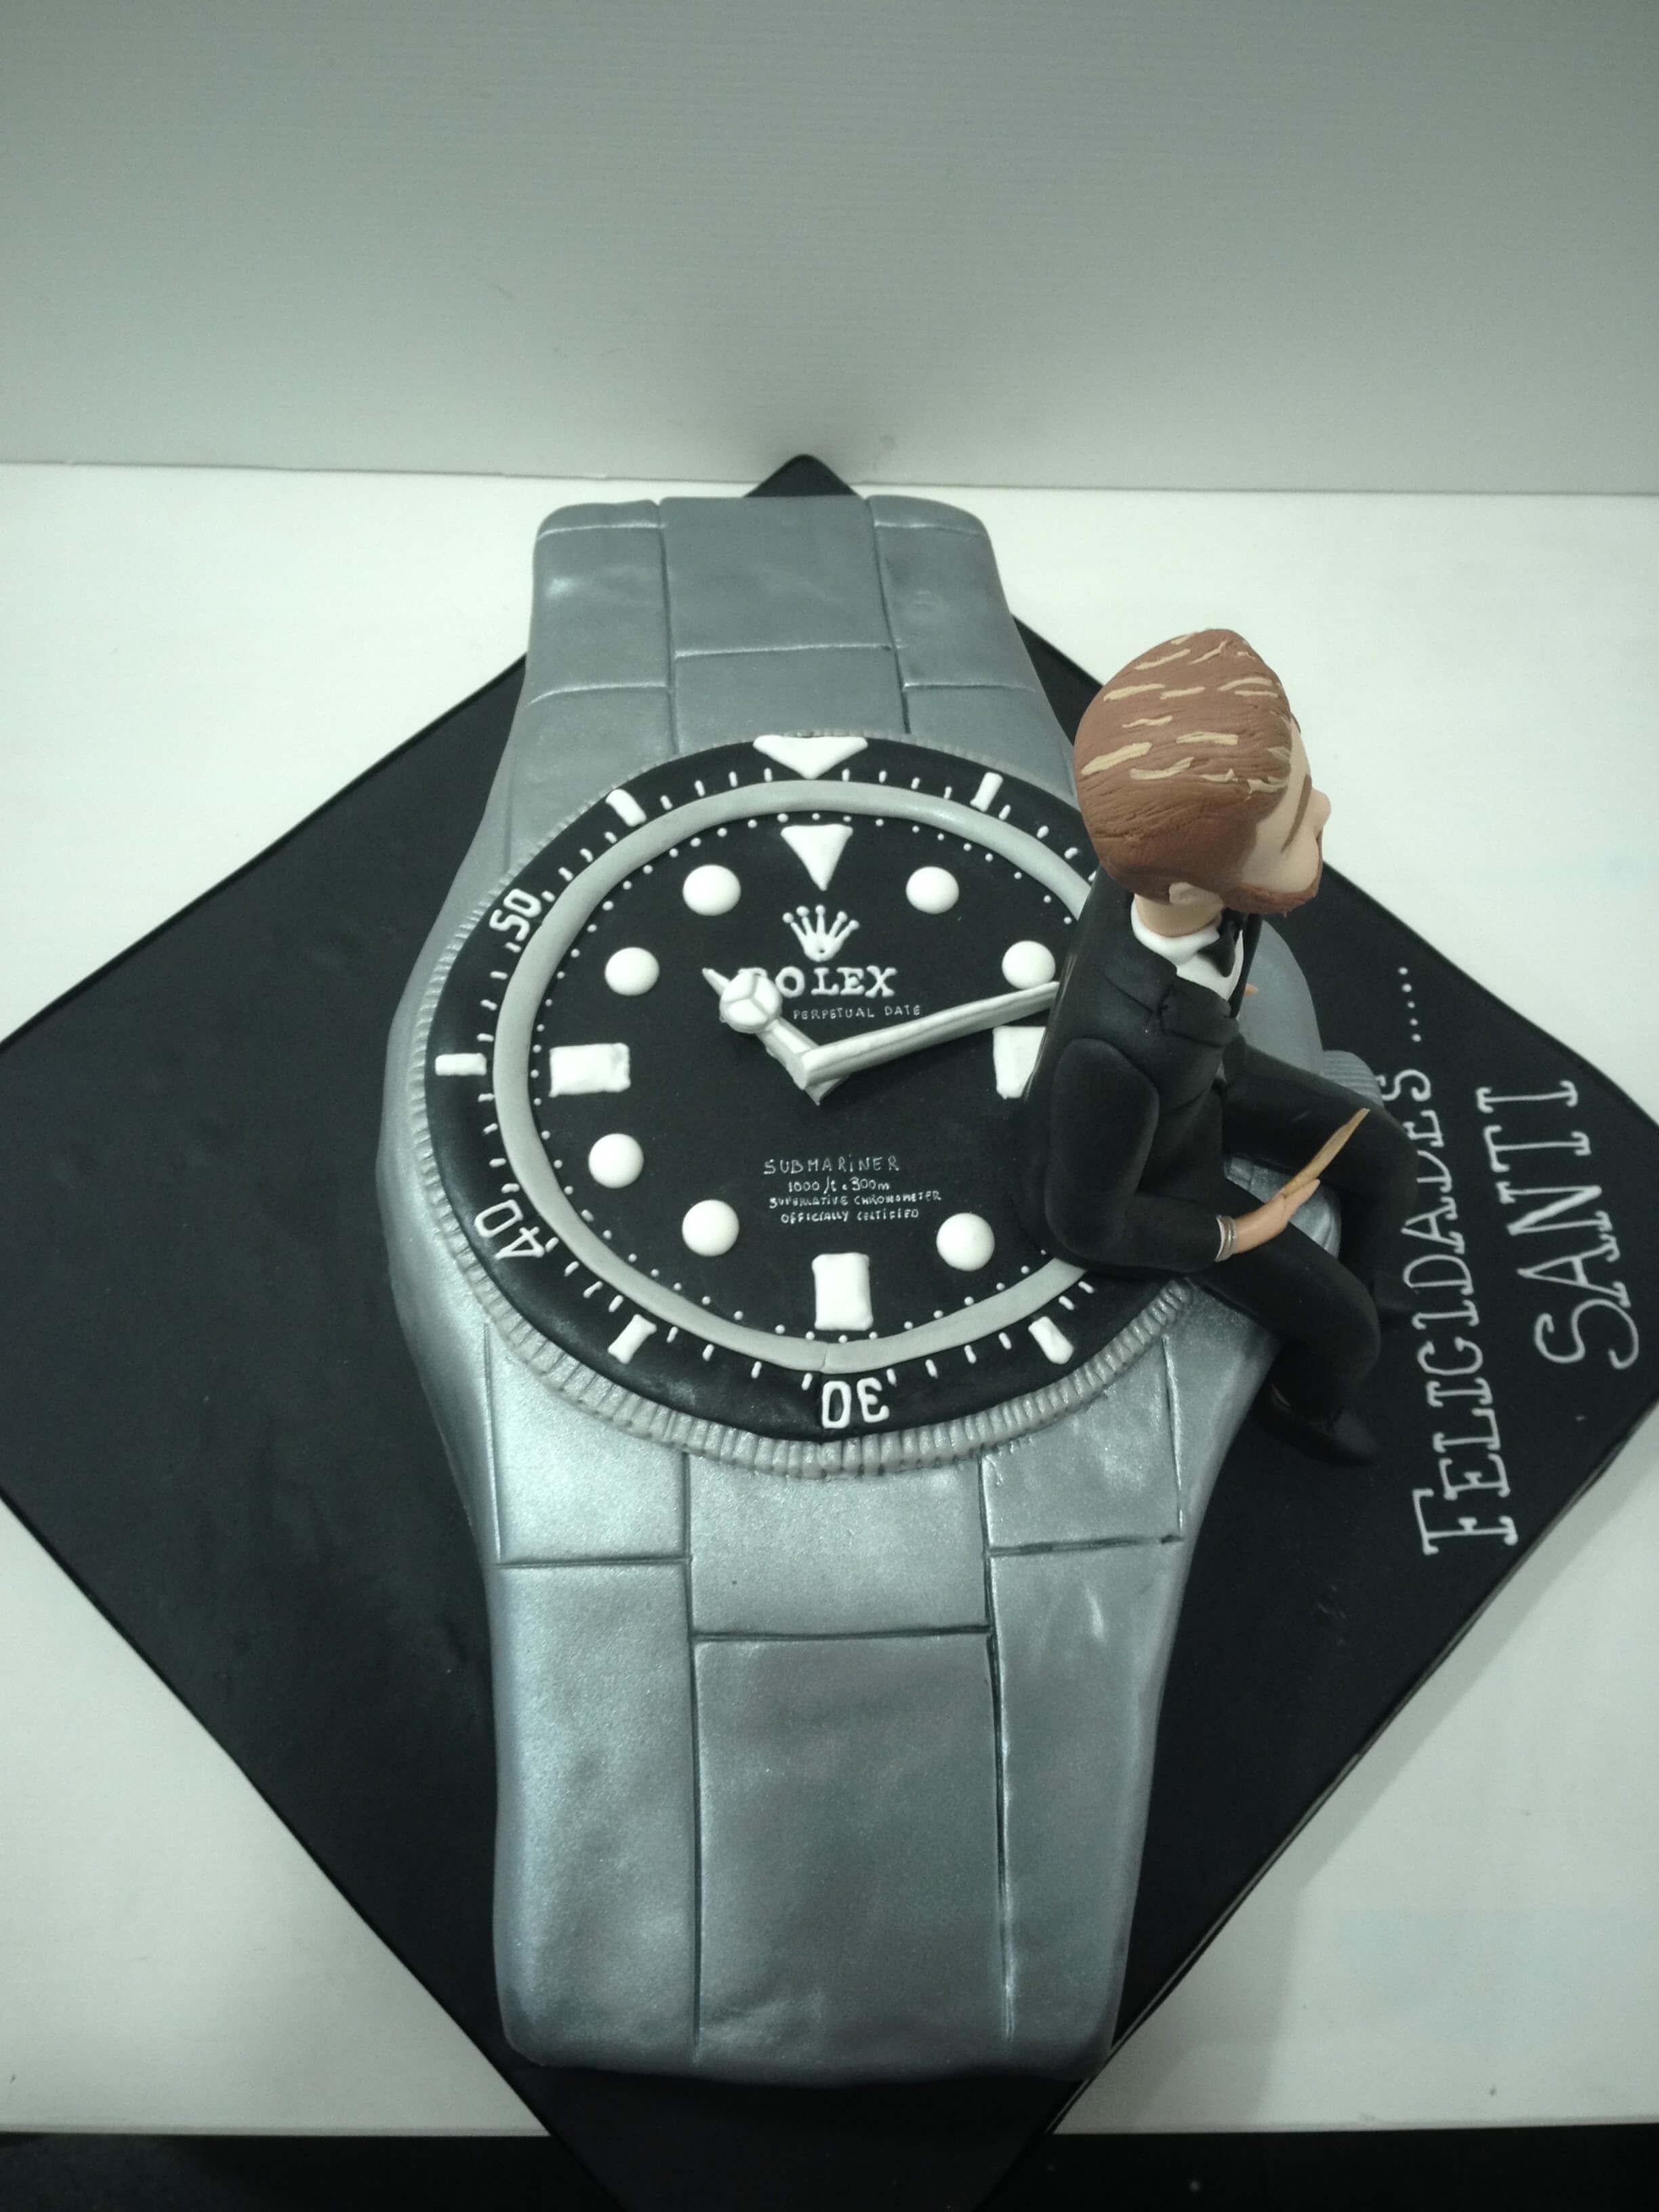 Tarta cumpleaños personalizada fondant Rolex reloj  coruña